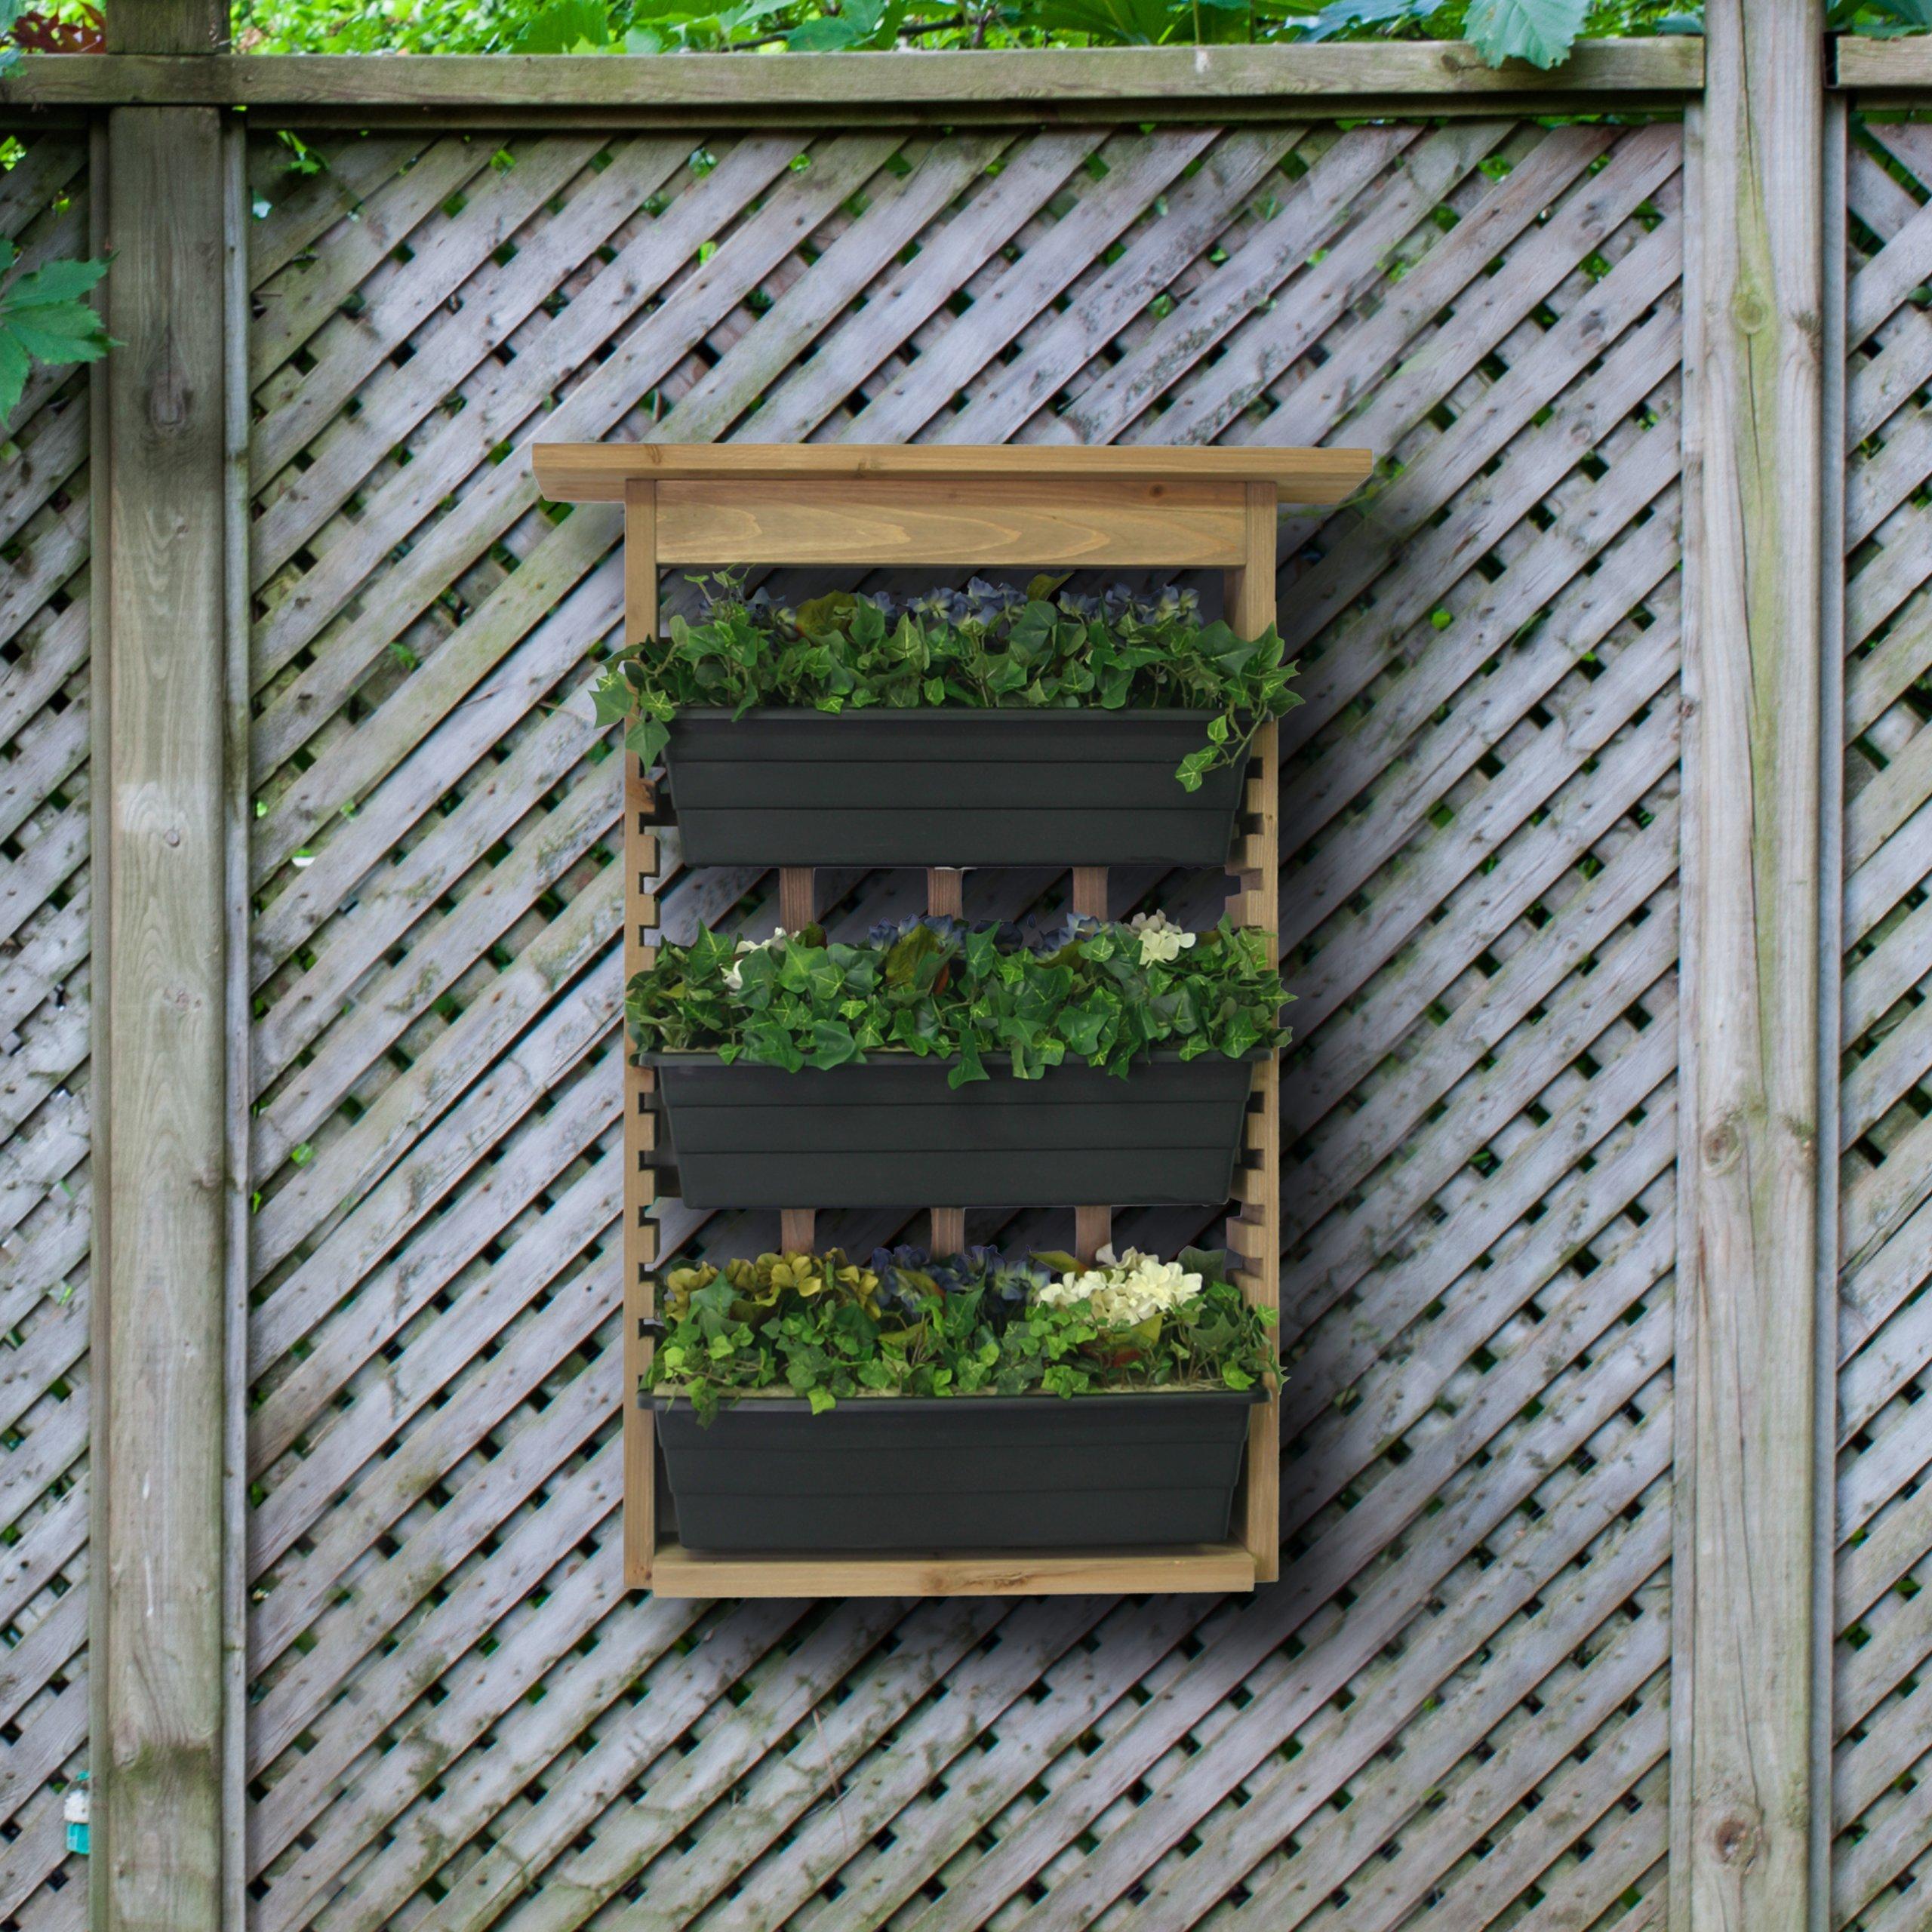 Algreen 34002 Garden View Vertical Living Wall Planter Ebay